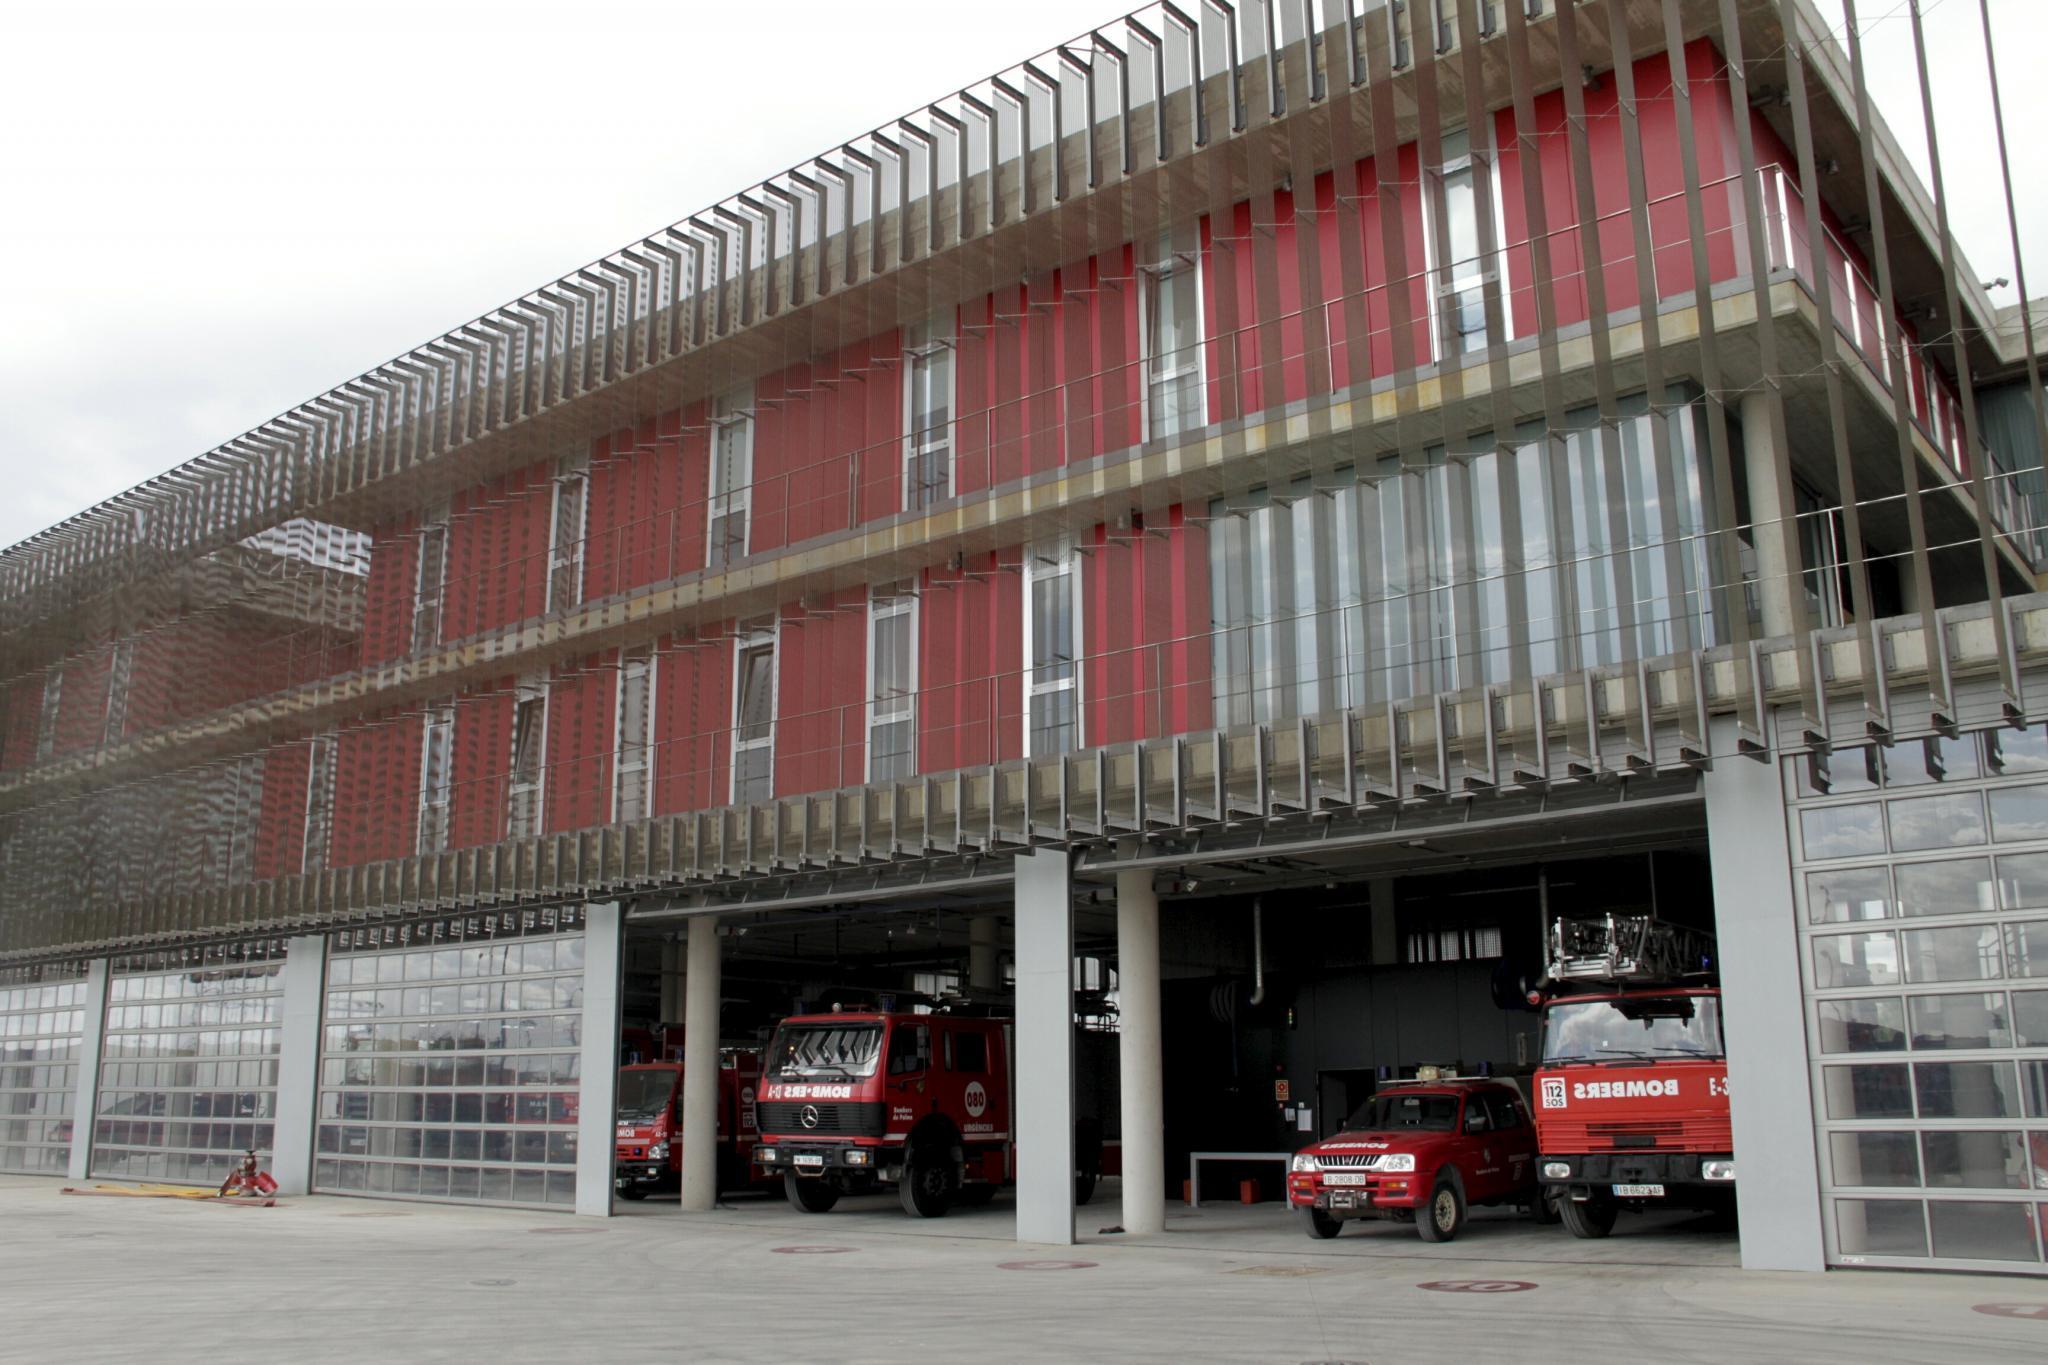 Parque de bomberos de Palma de Mallorca Instalaciones